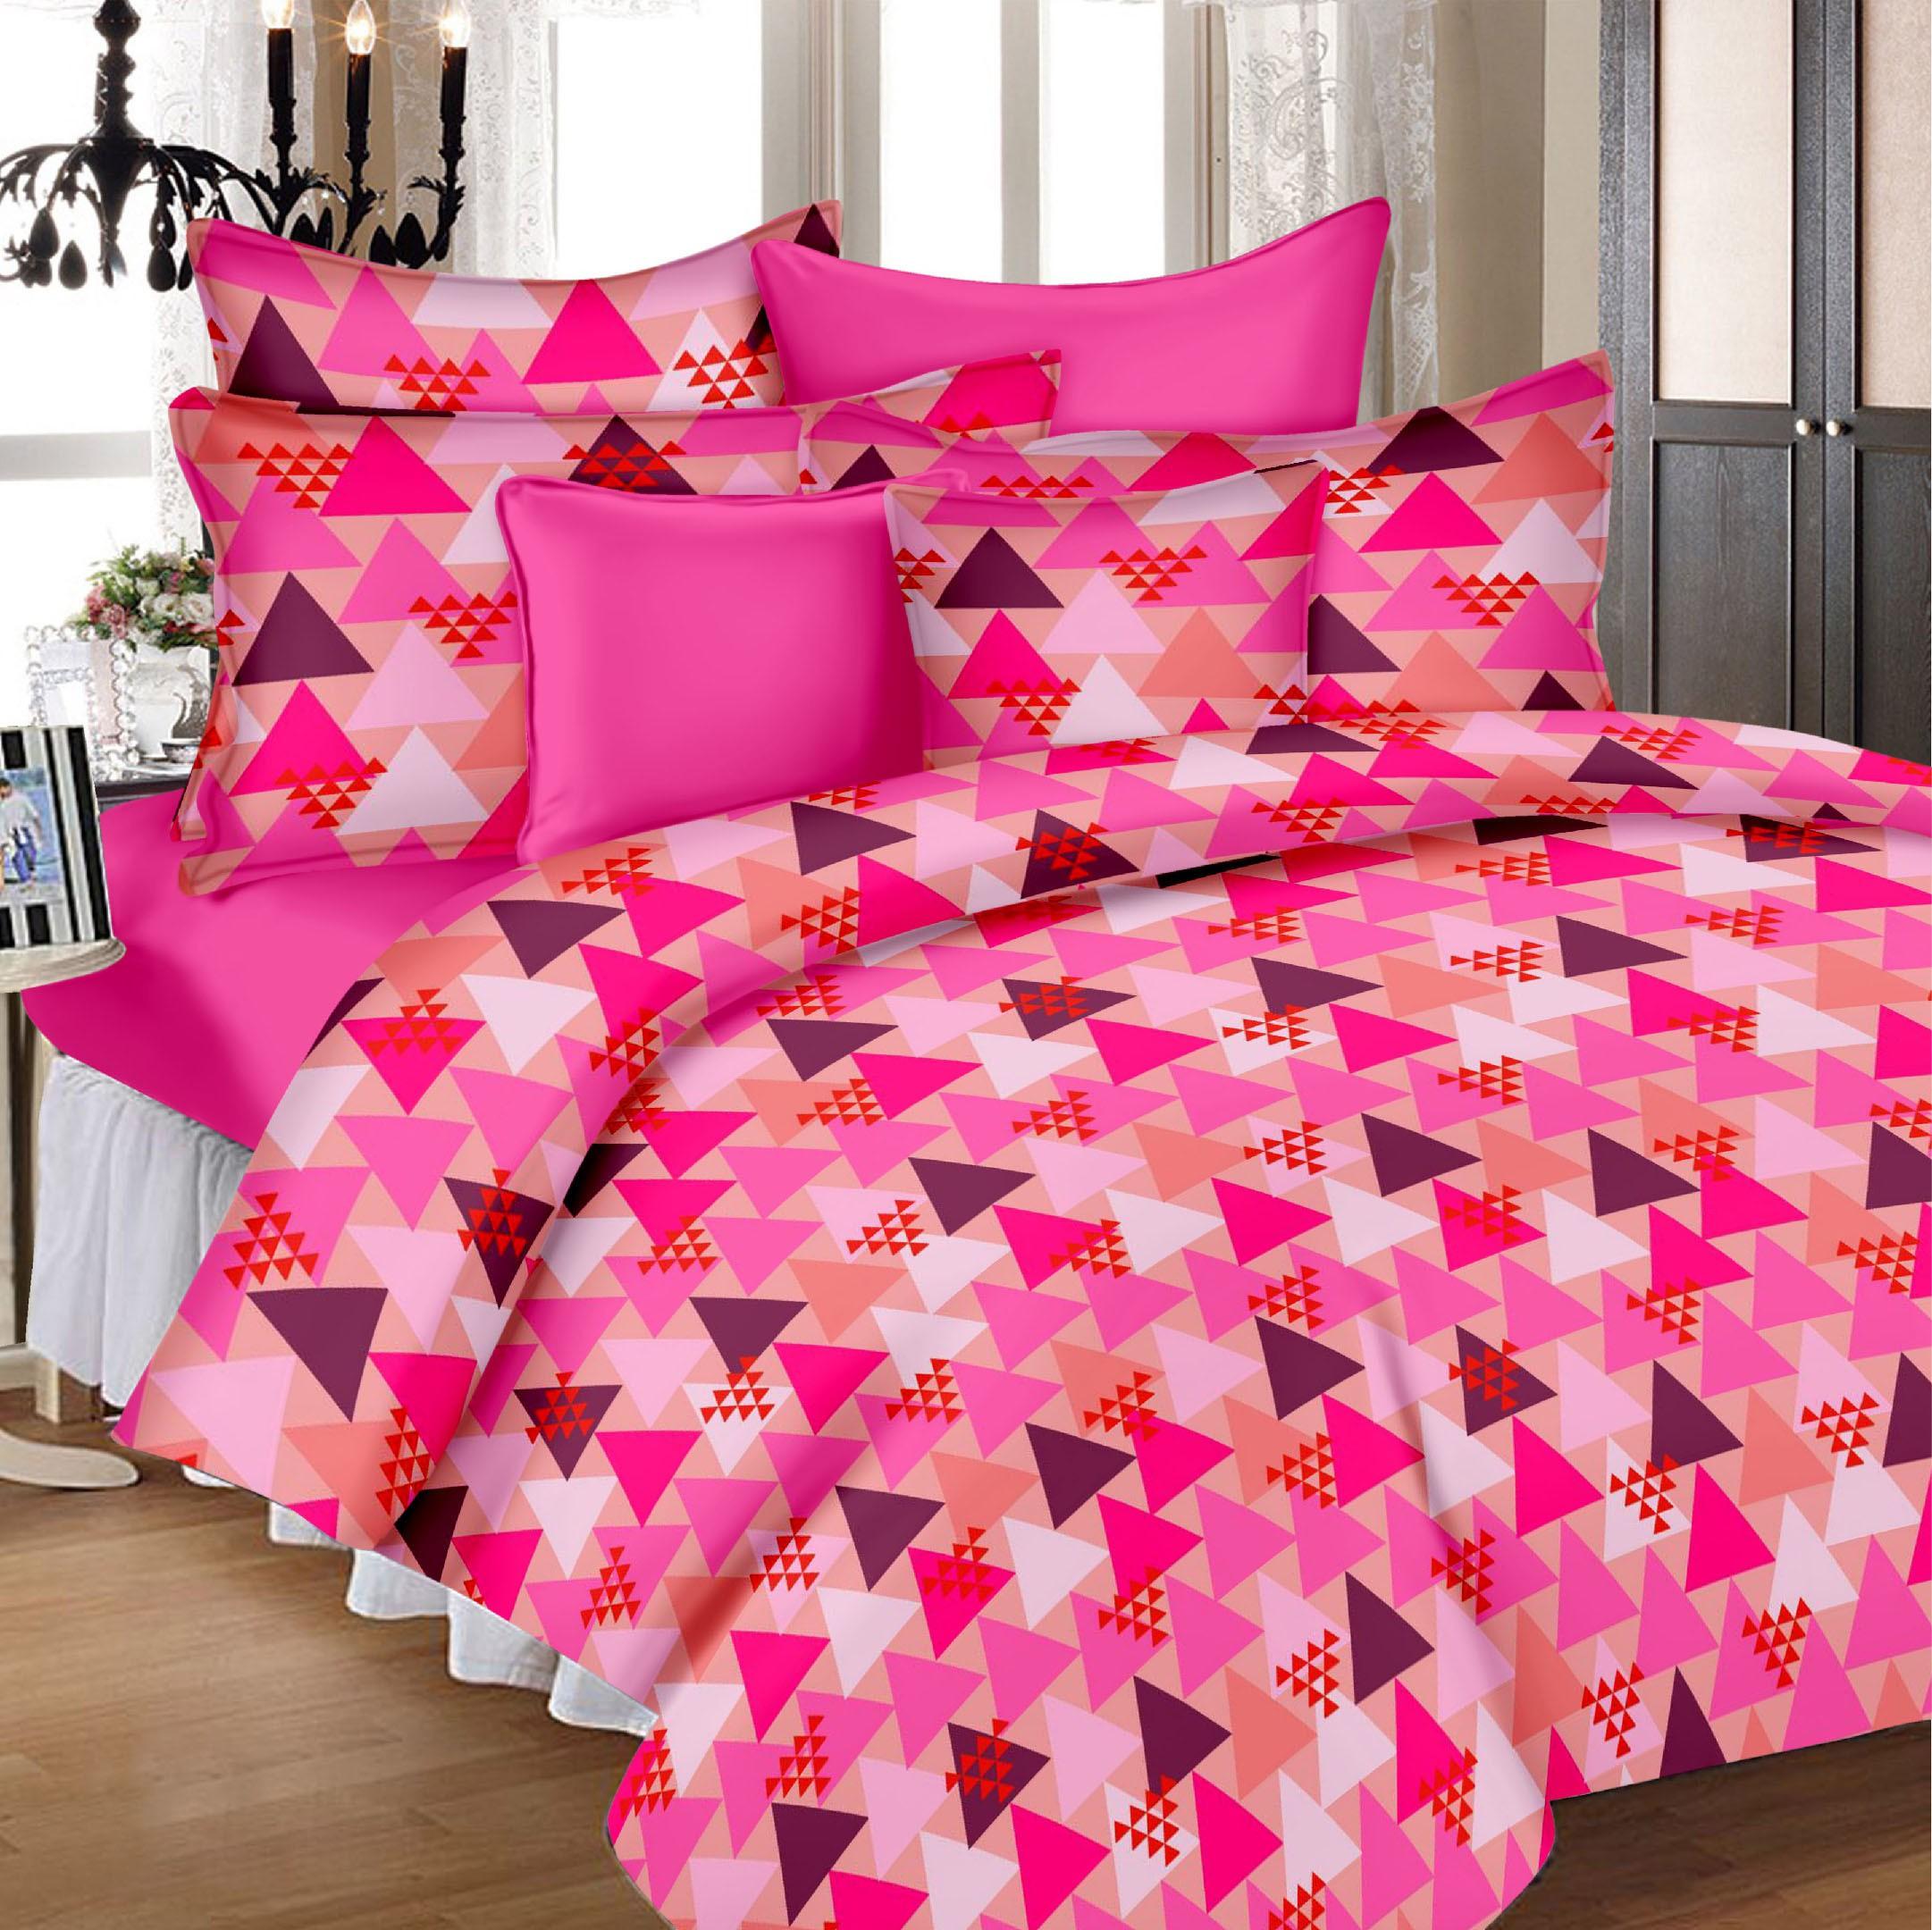 Flipkart SmartBuy Cotton Geometric Double Bedsheet(1 BEDSHEETS AND 2 PILLOW COVER, Multicolor)